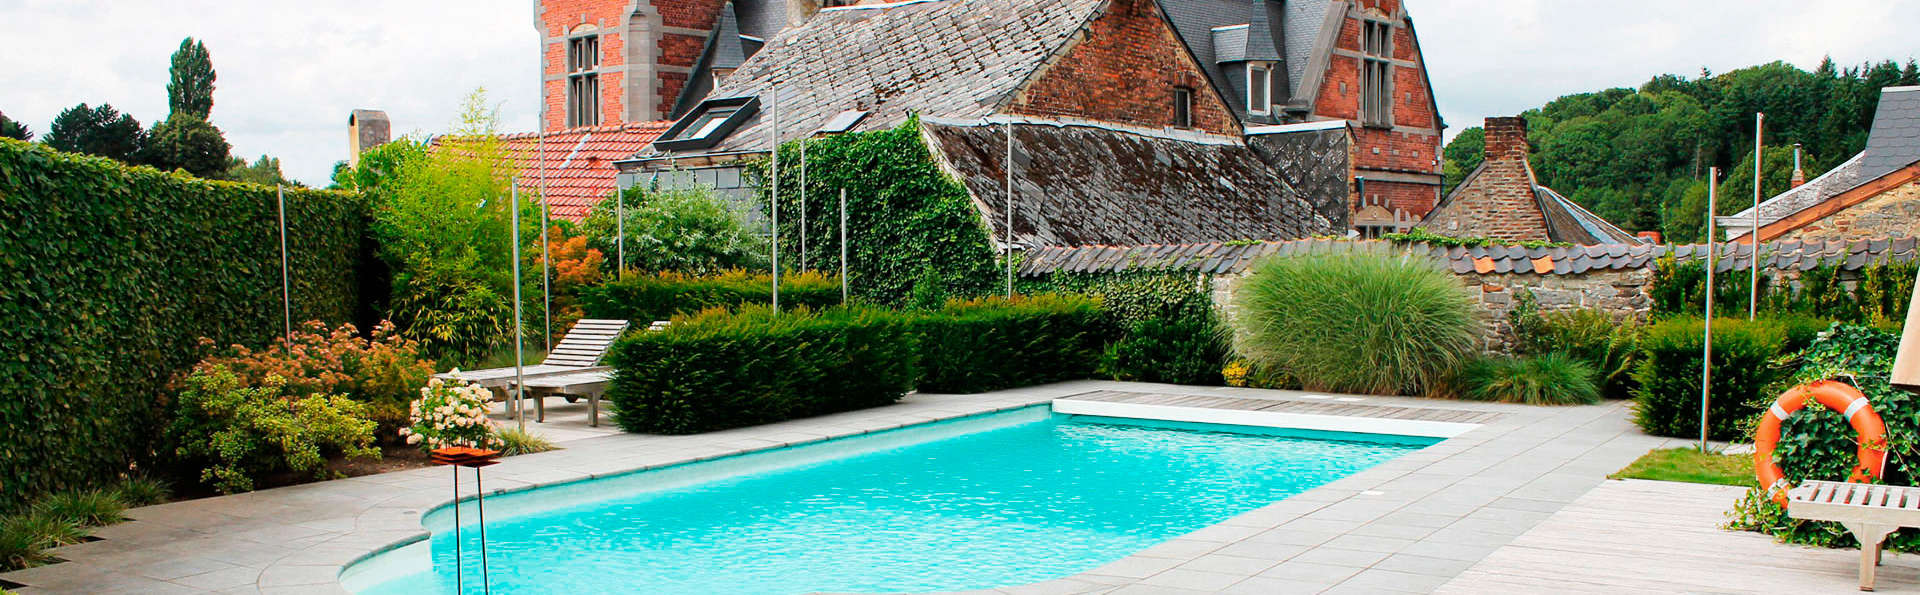 Le Castel - EDIT_pool1.jpg